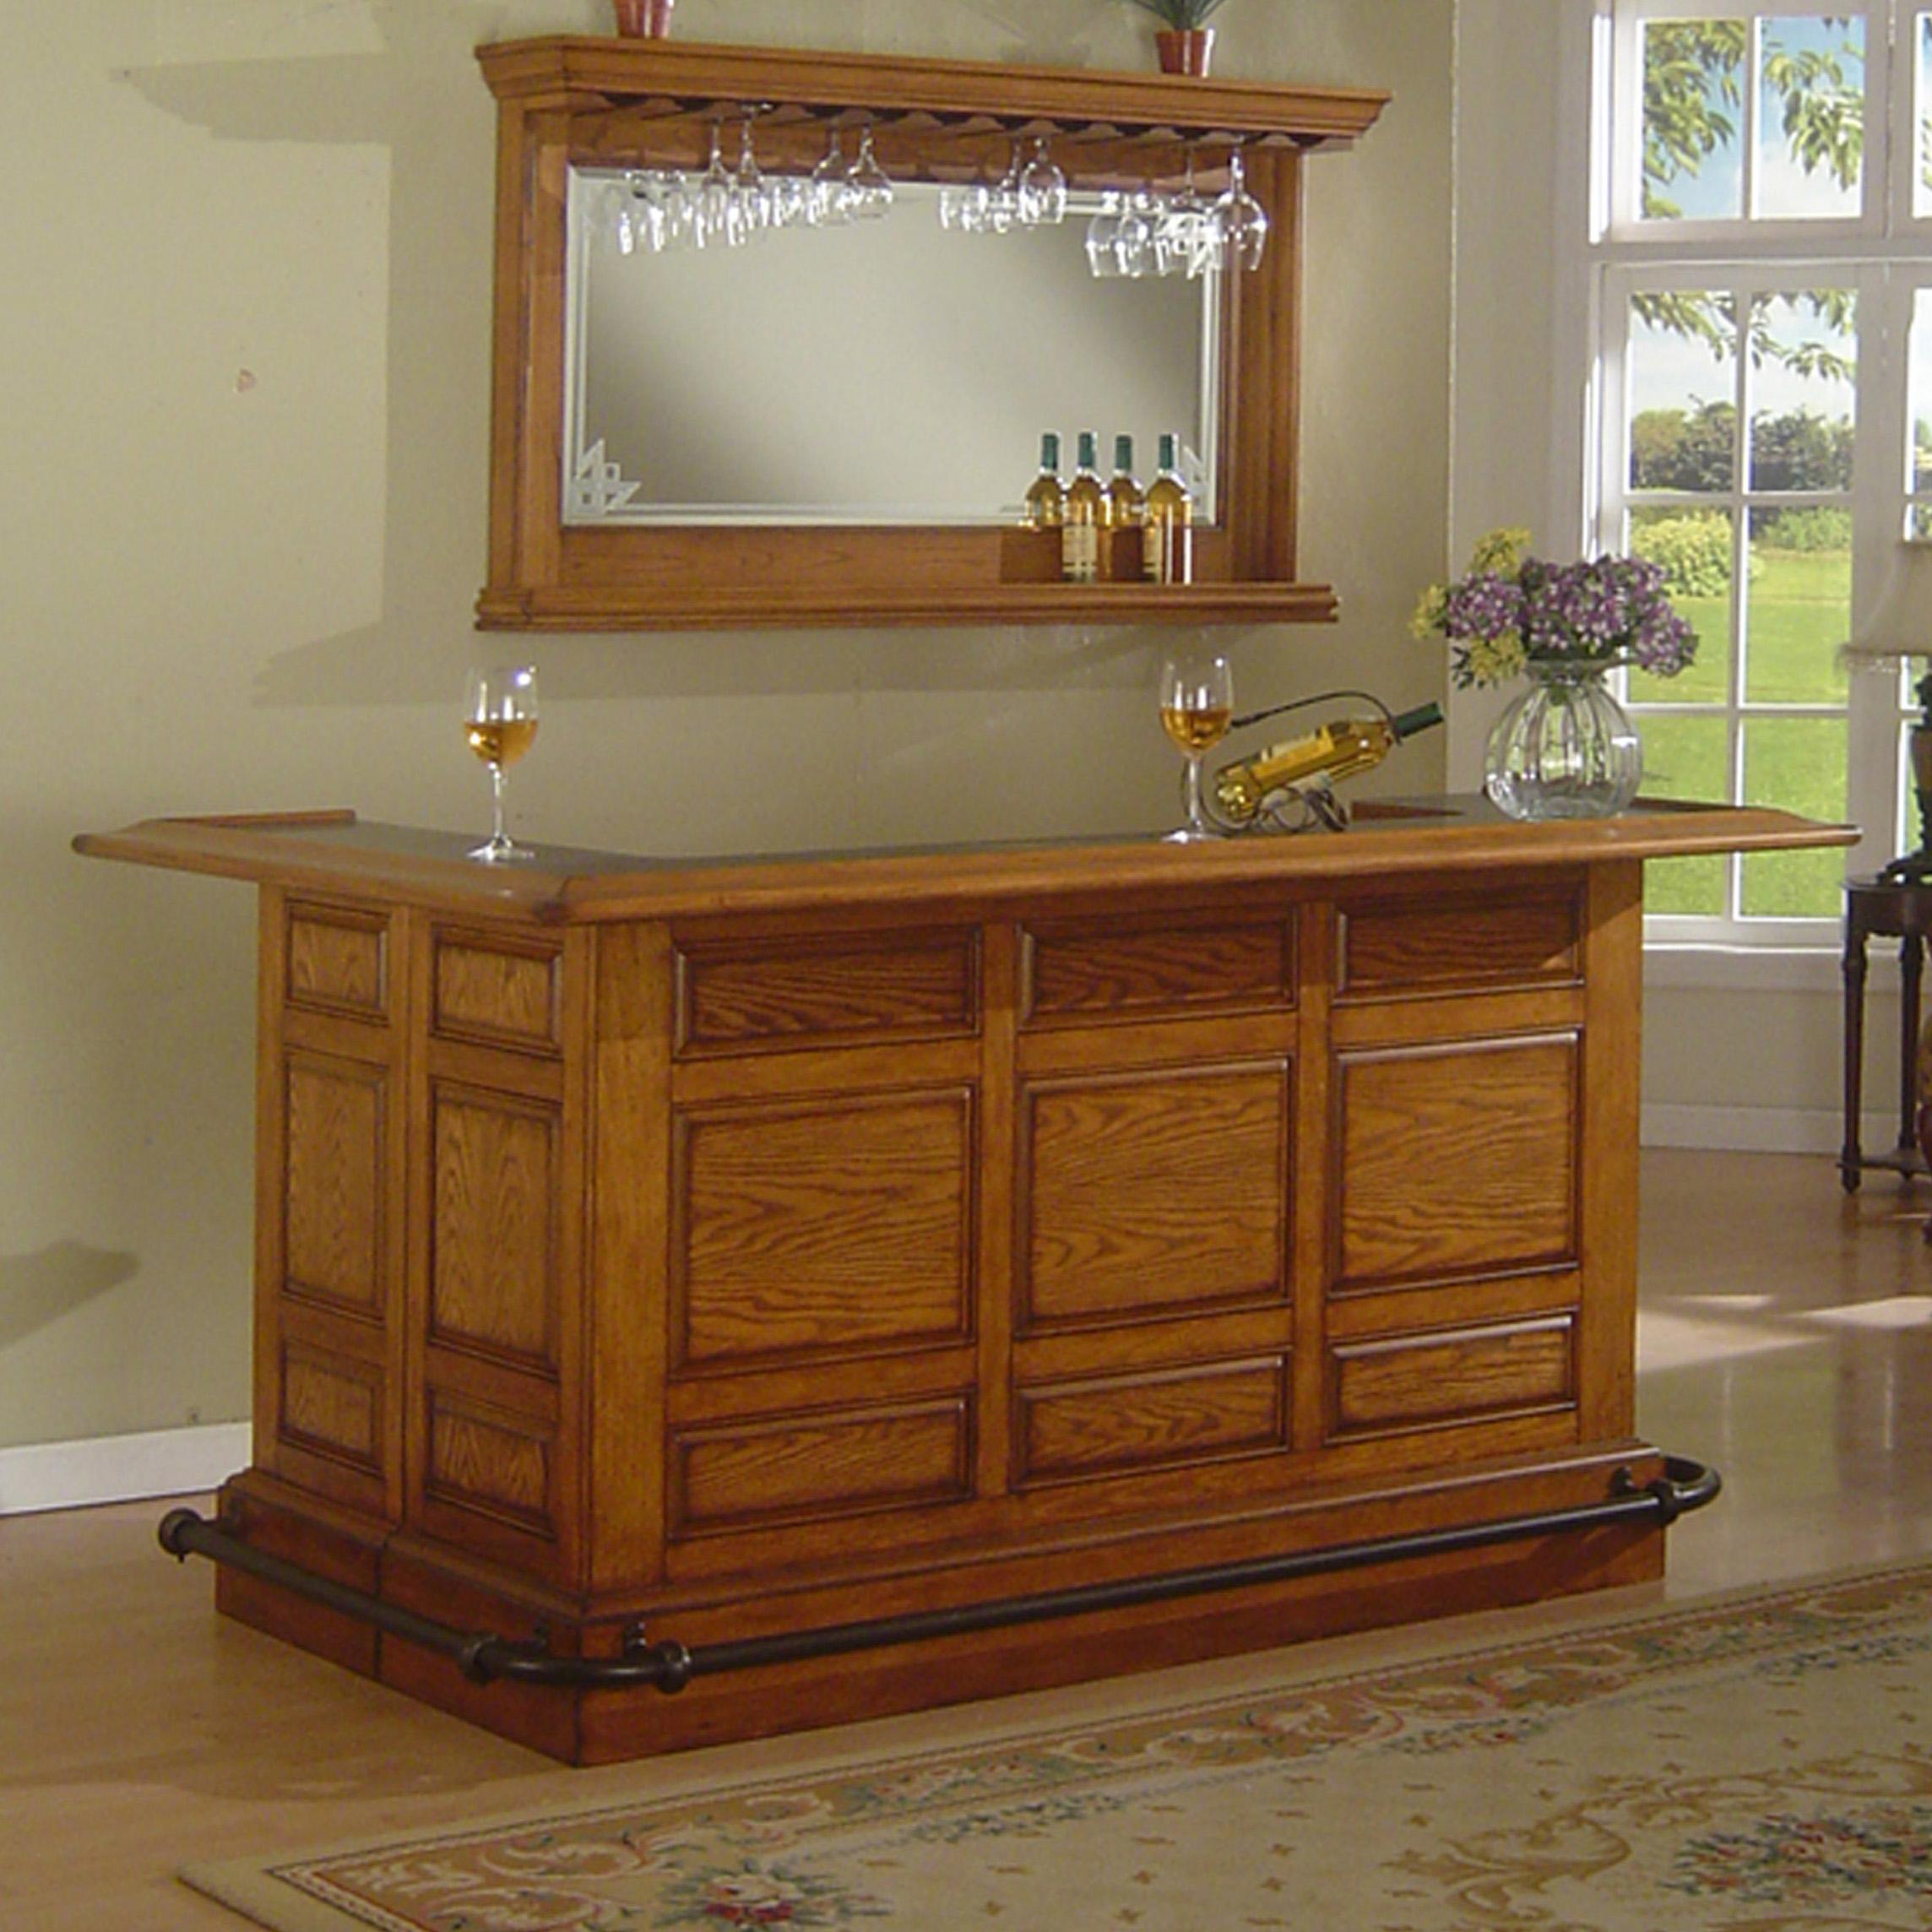 E.C.I. Furniture Bars Manchester Raised Panel Bar - Item Number: 1150-03-RB+RT+R